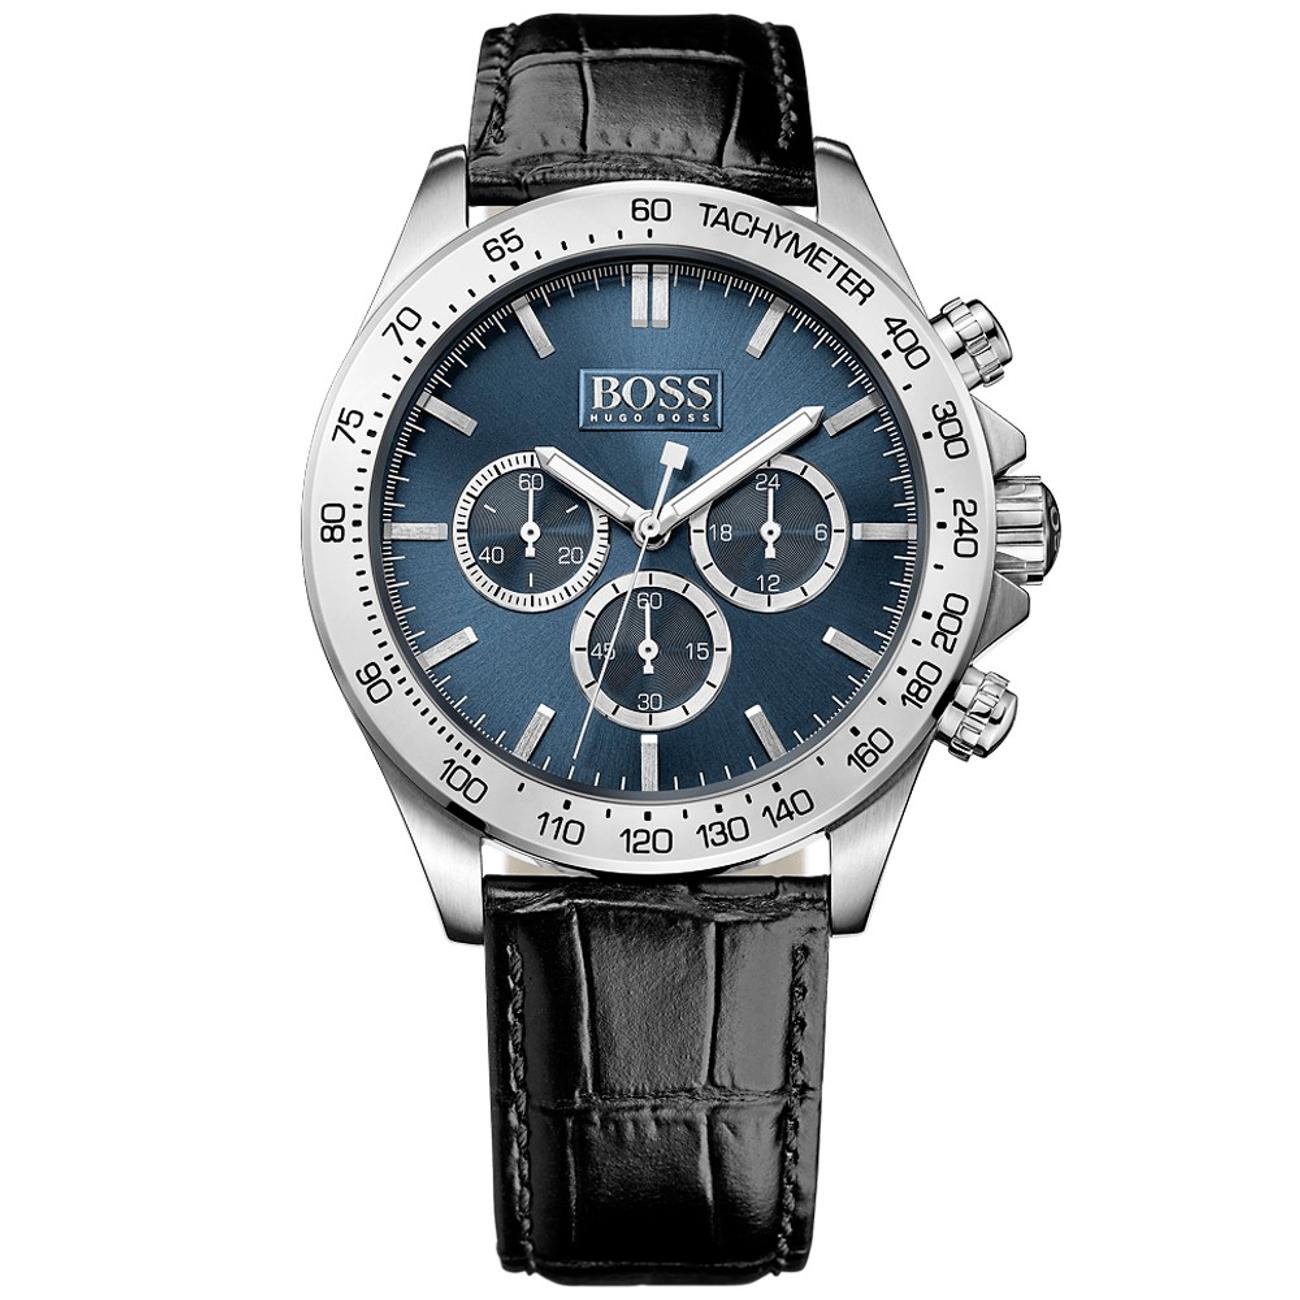 14450a963d07 Hugo Boss Ikon - Style Watch